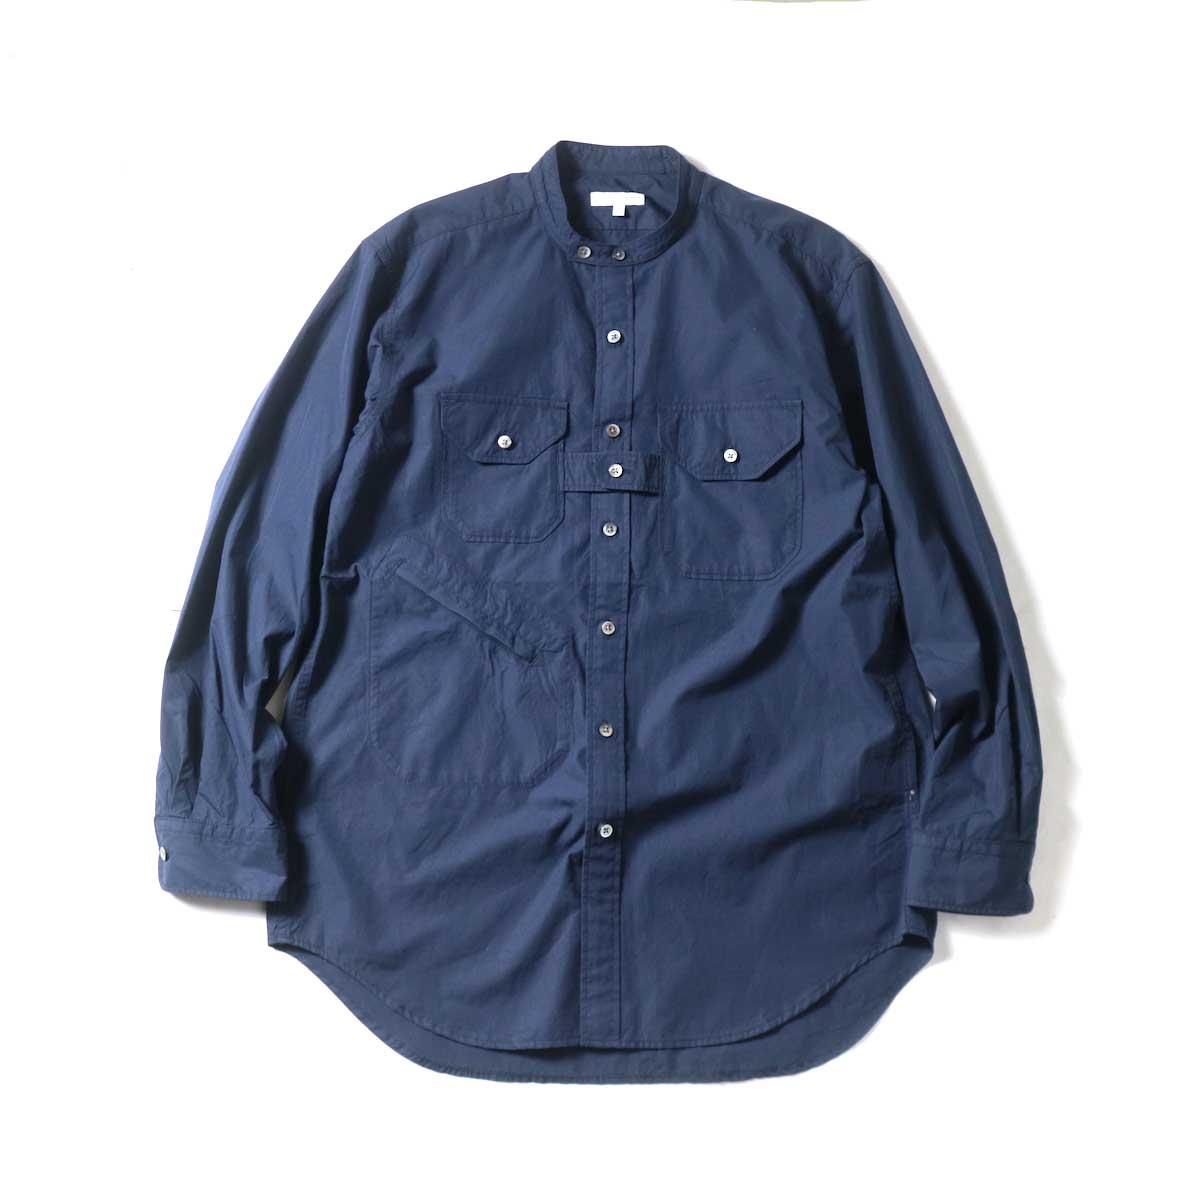 Engineered Garments / Banded Collar Shirt -100